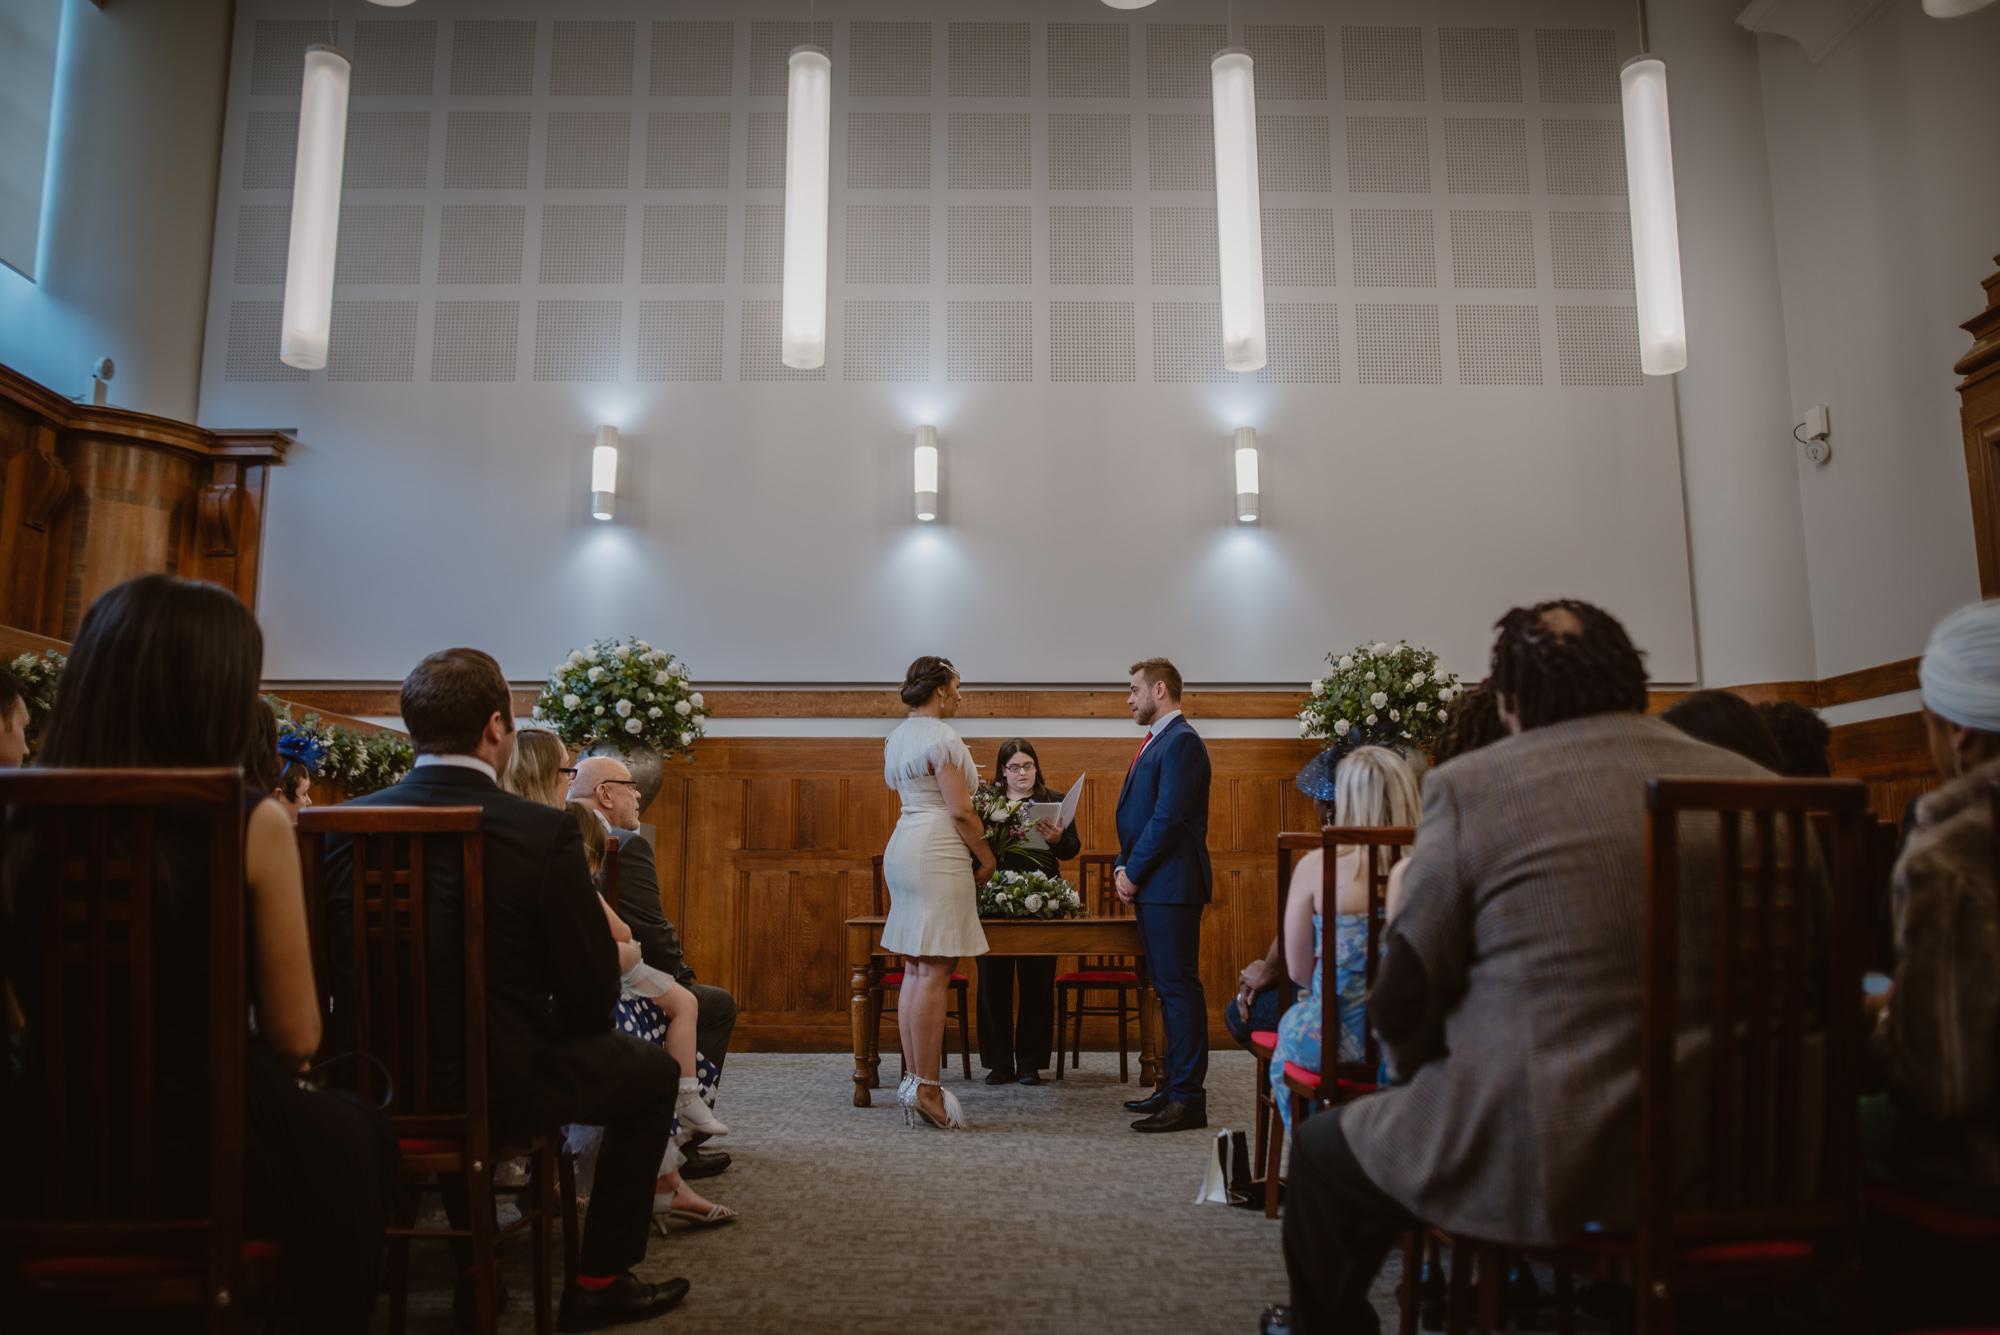 Jacqueline-Gareth-Wedding-Westmead-Events-Surrey-Manu-Mendoza-Wedding-Photography-044.jpg